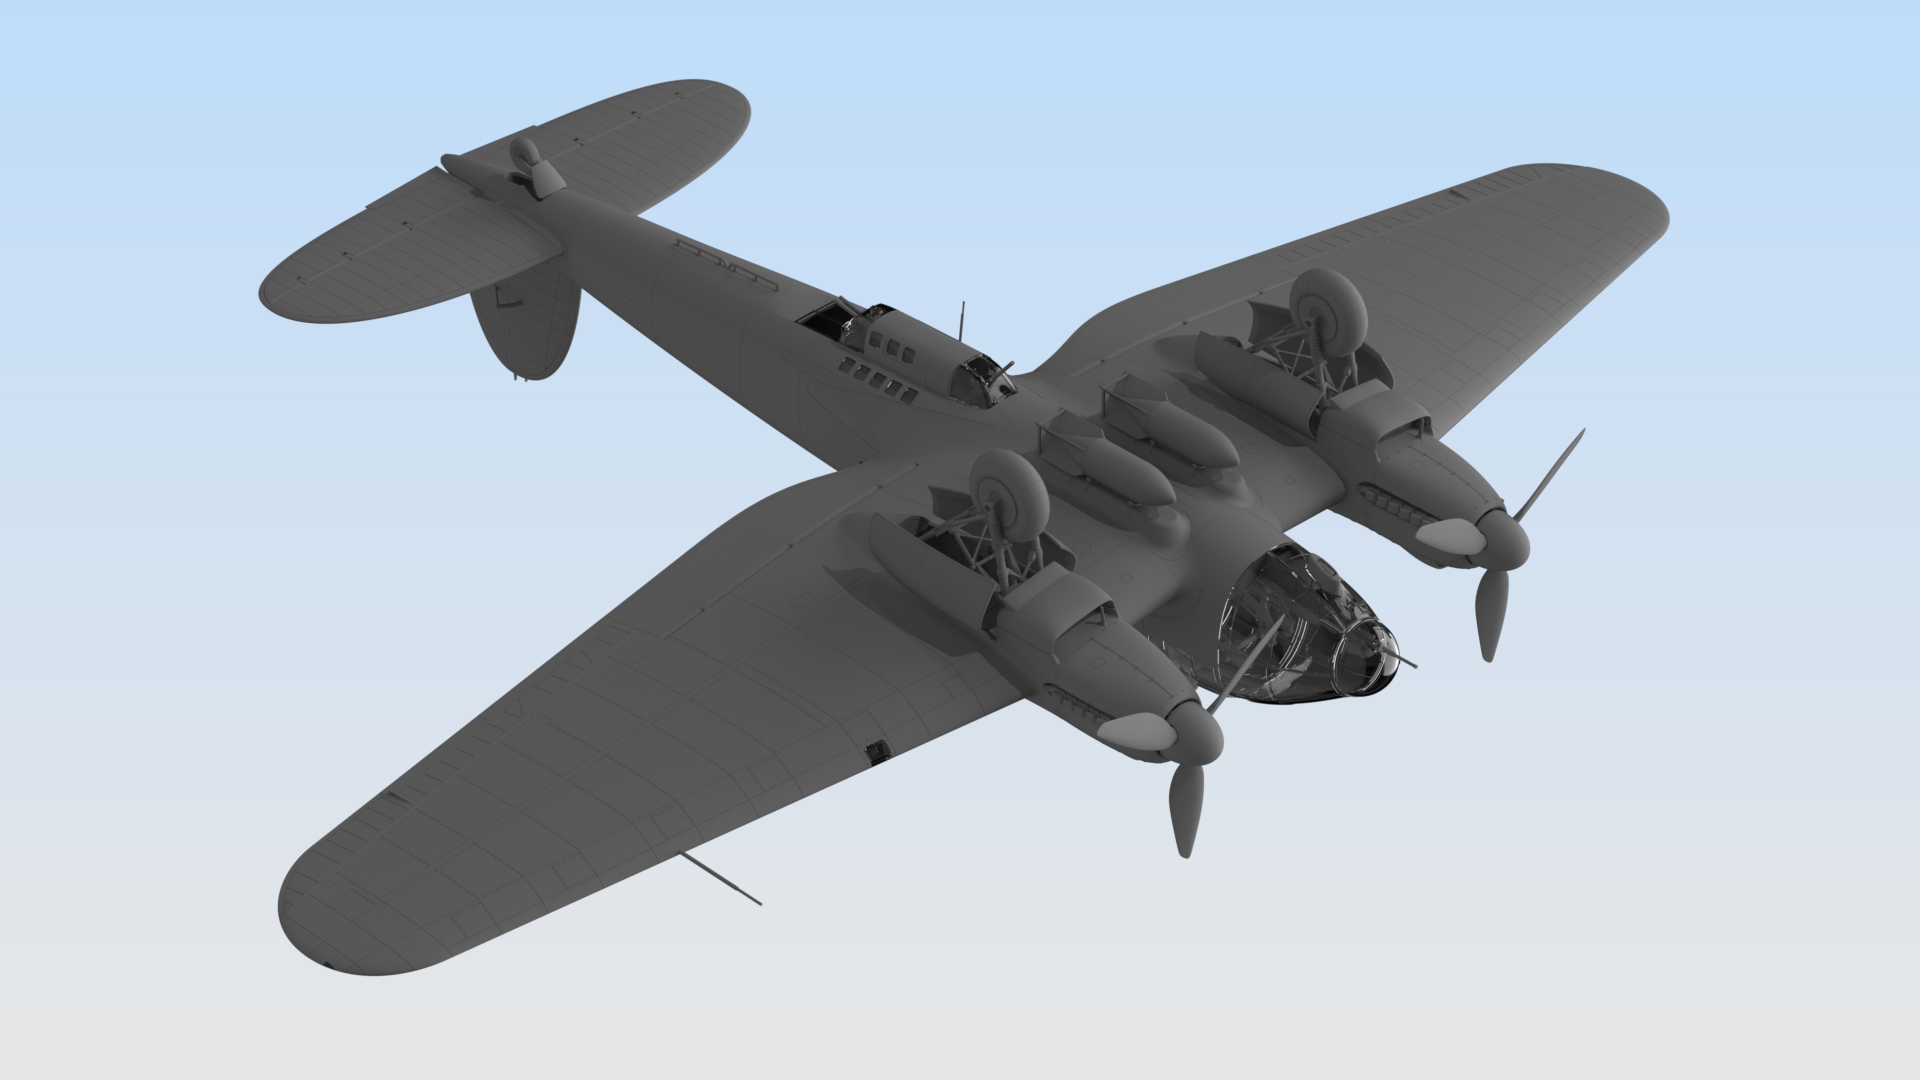 1/48 48263 He 111H-16, Германский бомбардировщик ІІ МВ \ He 111H-16, WWII German Bomber